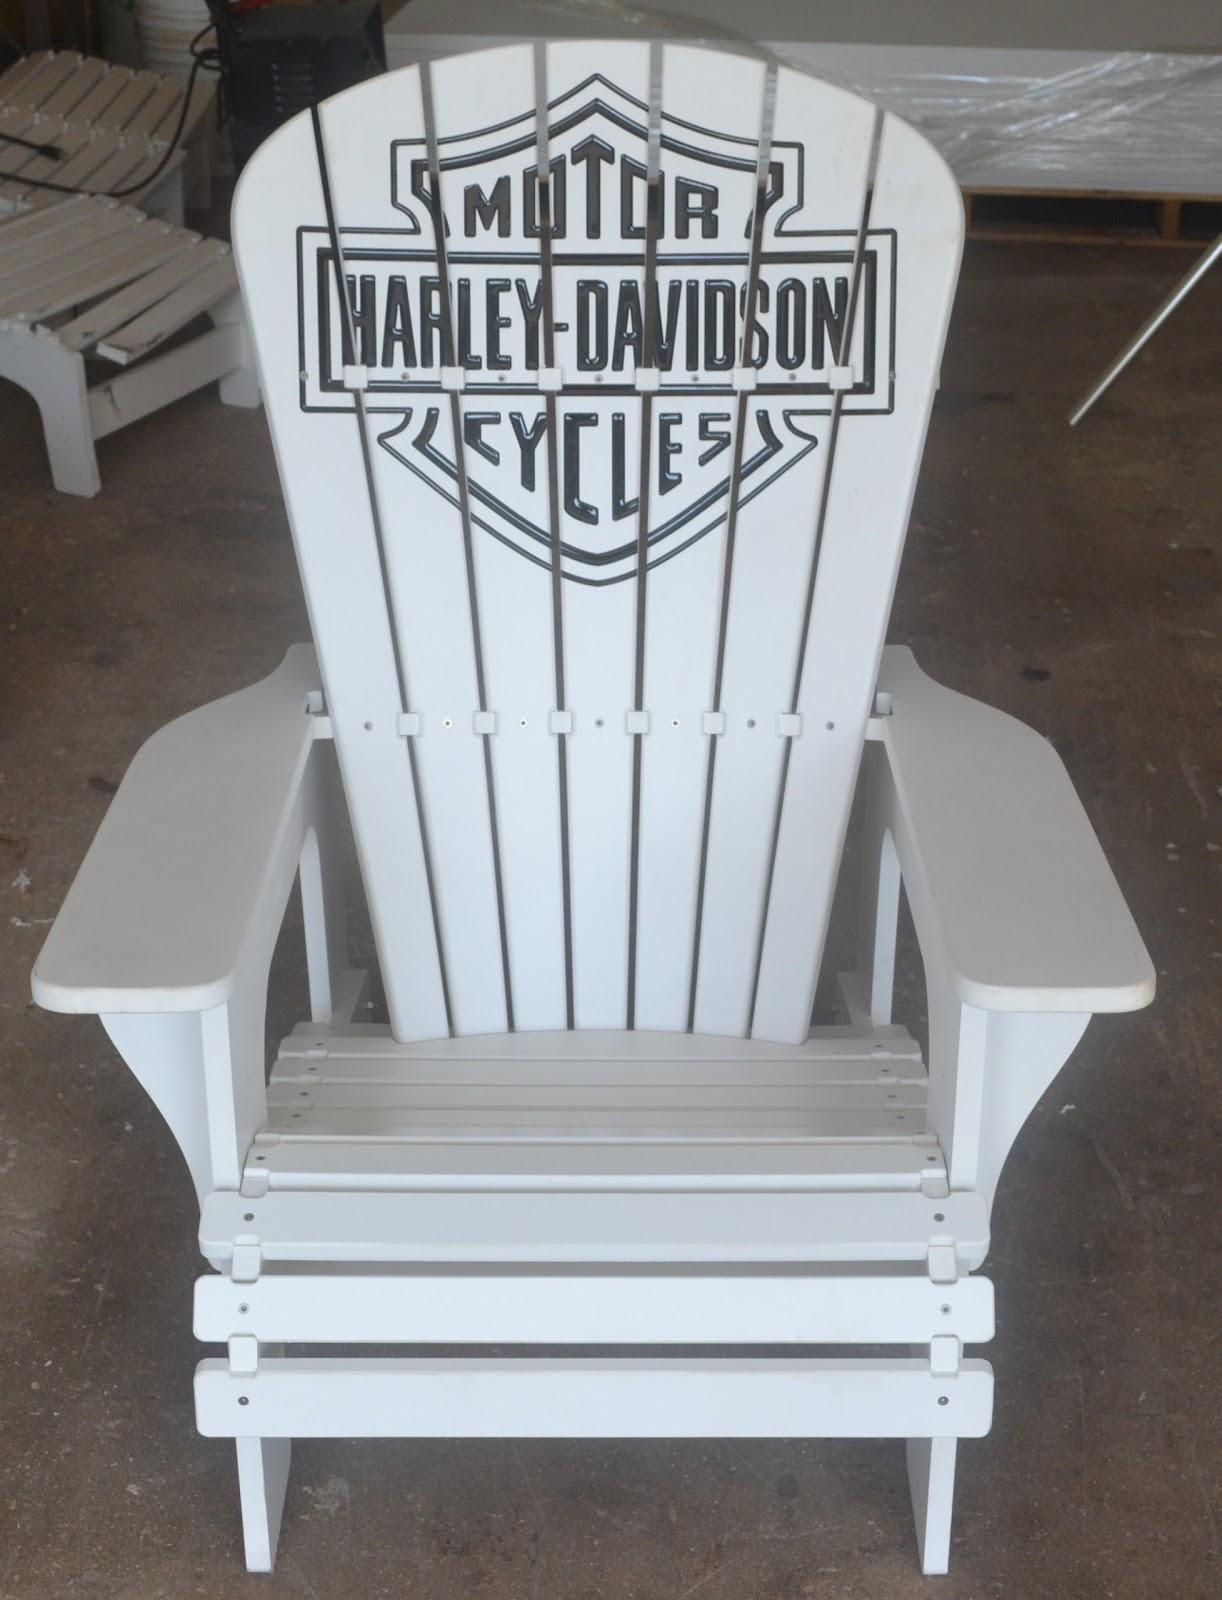 Harley Davidson Red Deer >> Cape Coral Adirondack